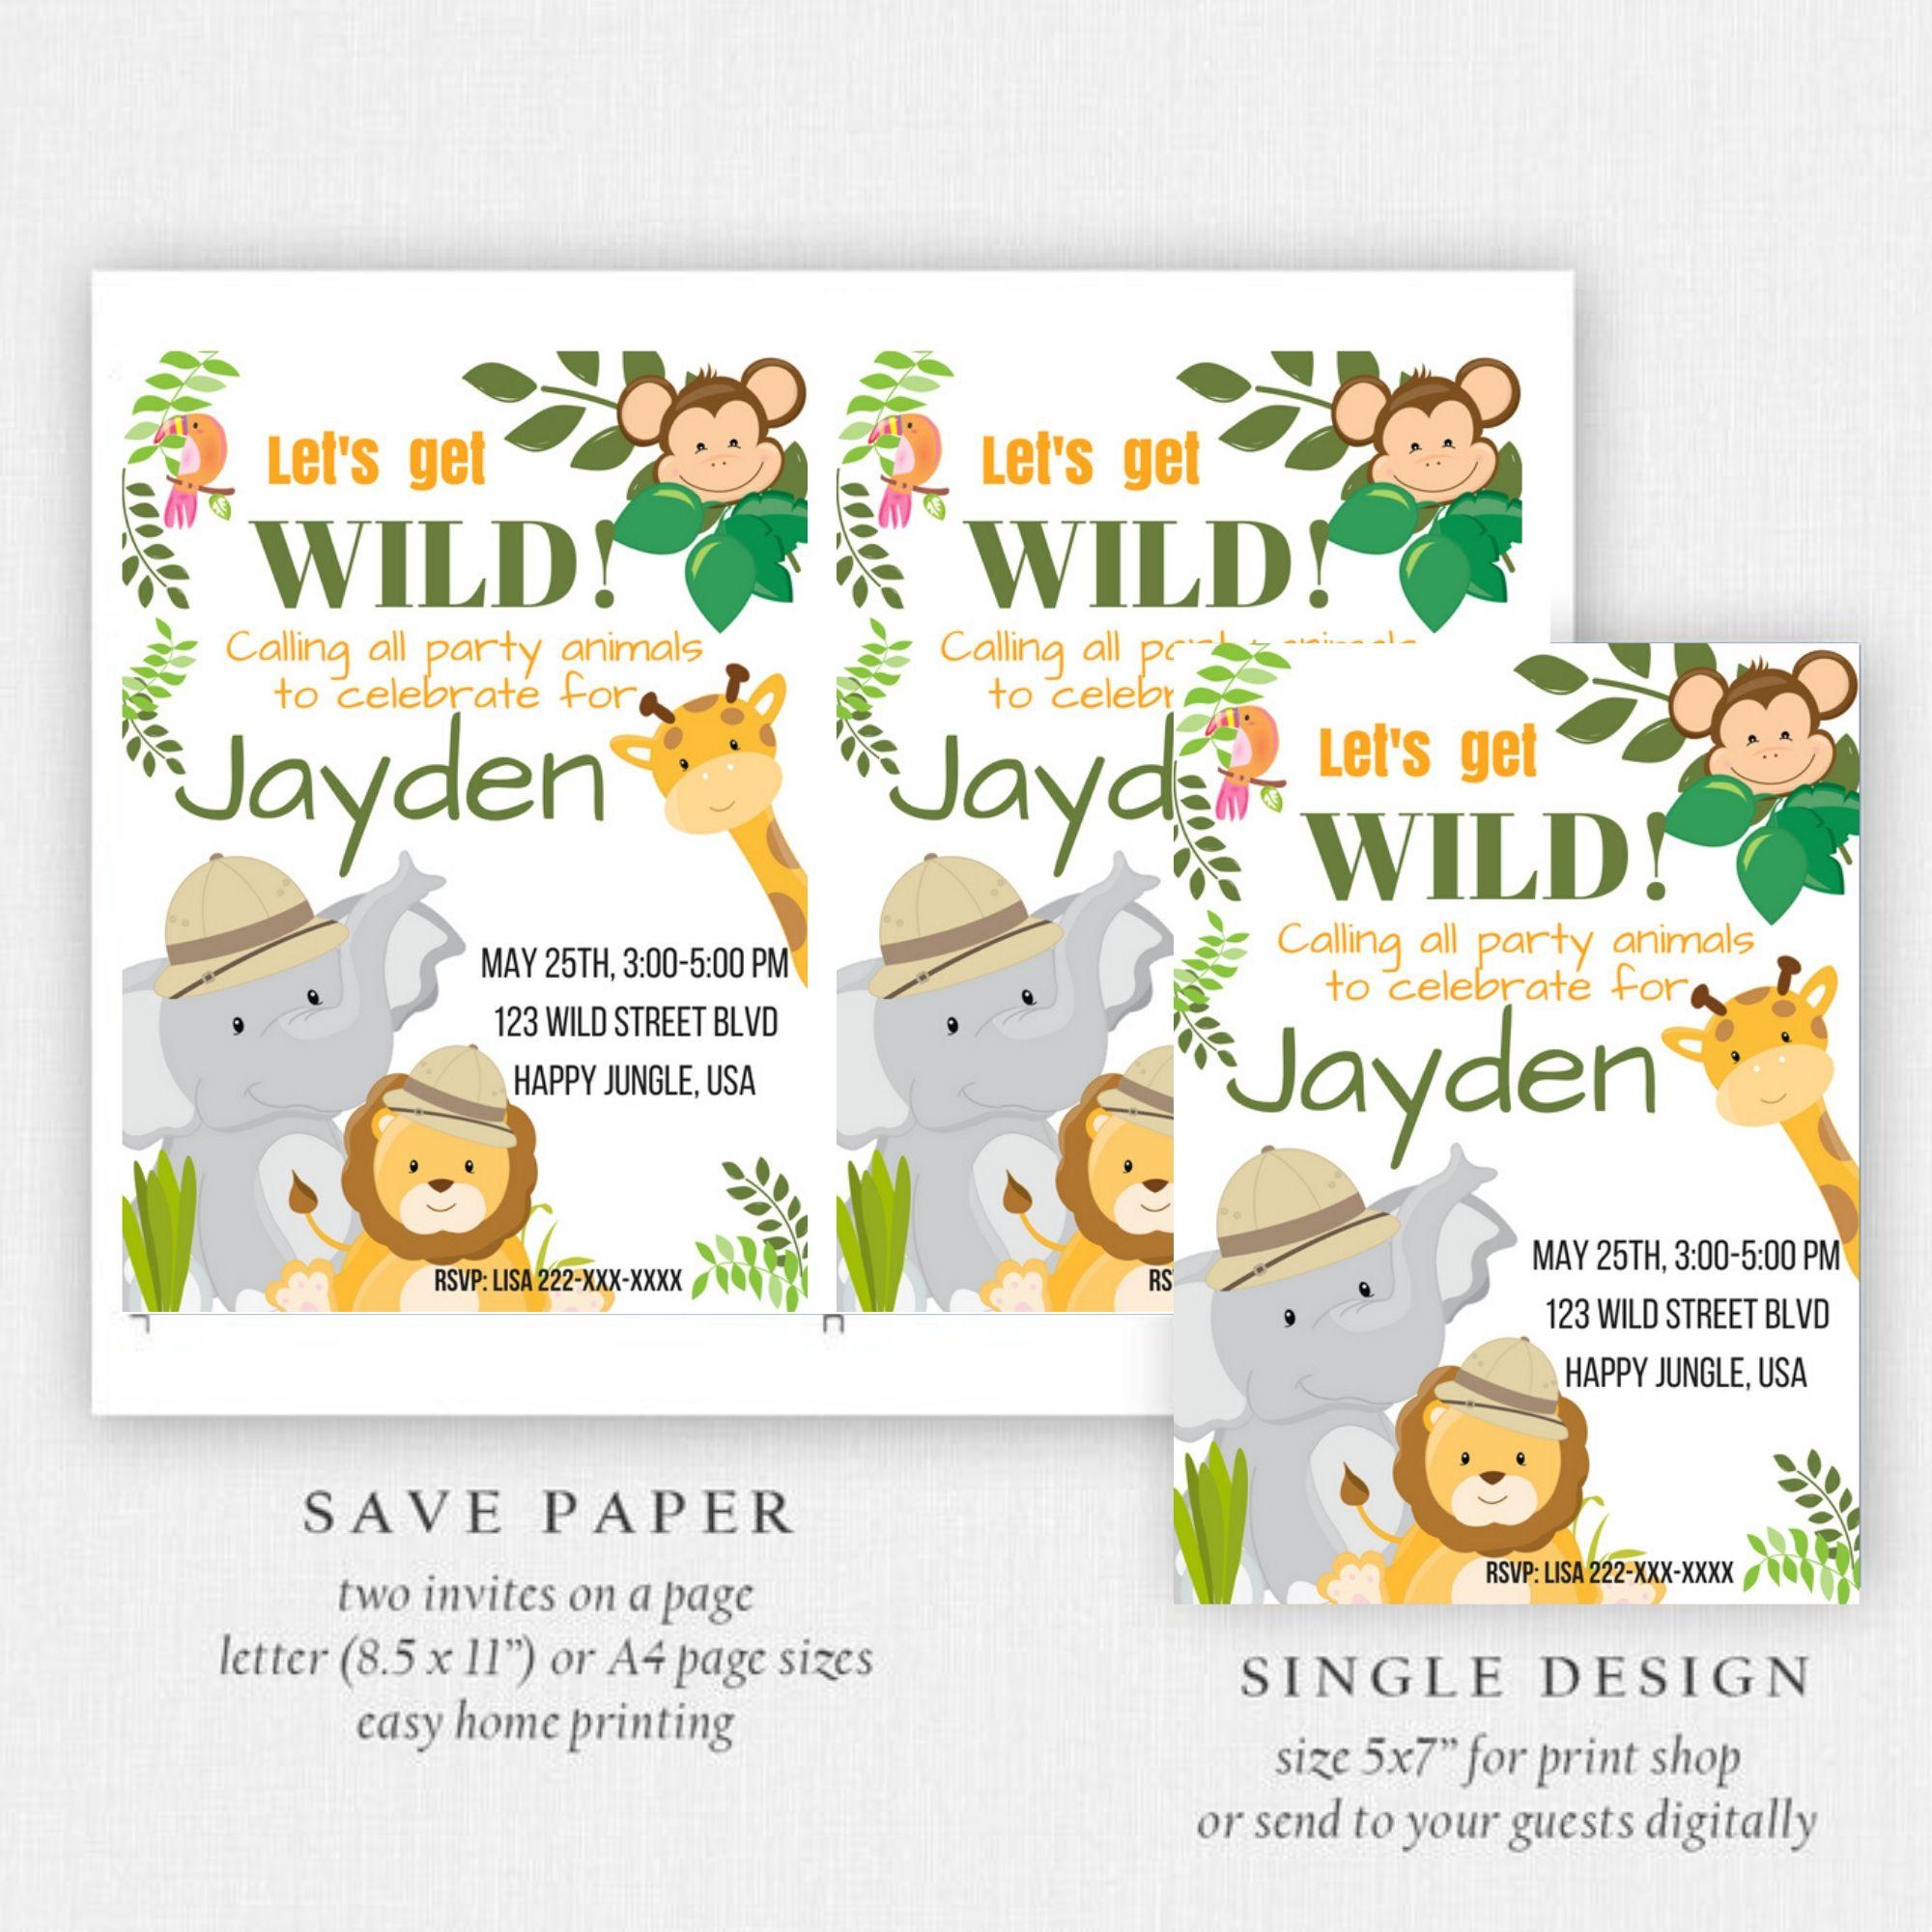 FREE PRINTABLE Jungle Safari Birthday Party